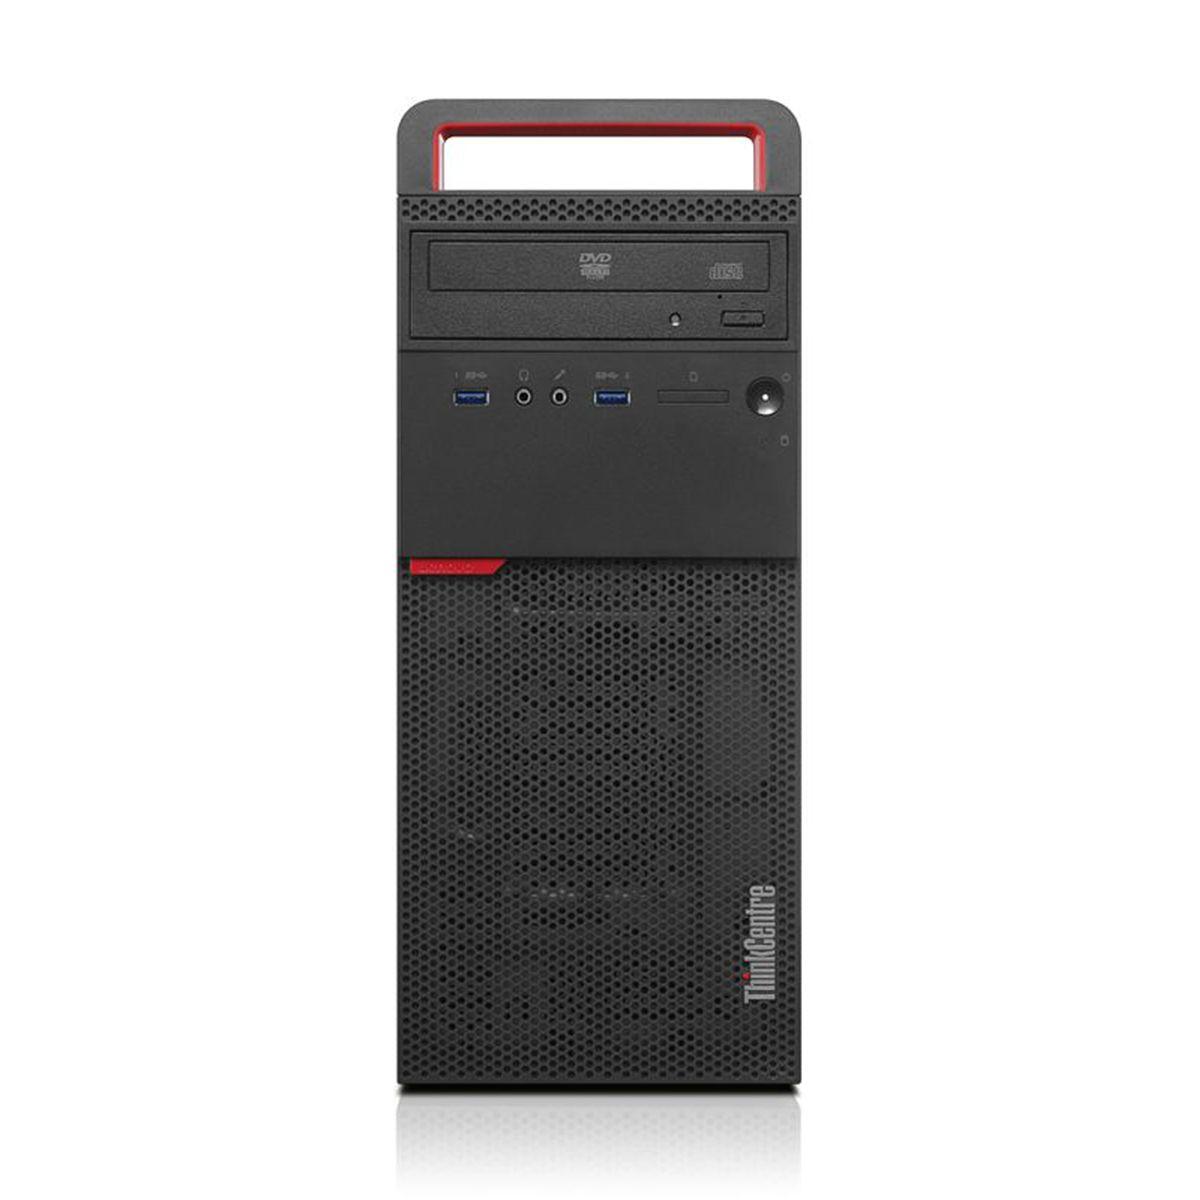 Computadora de escritorio Lenovo Lenovo M700 Core I5 6400 (6Ta Generacion) 4g 1tb